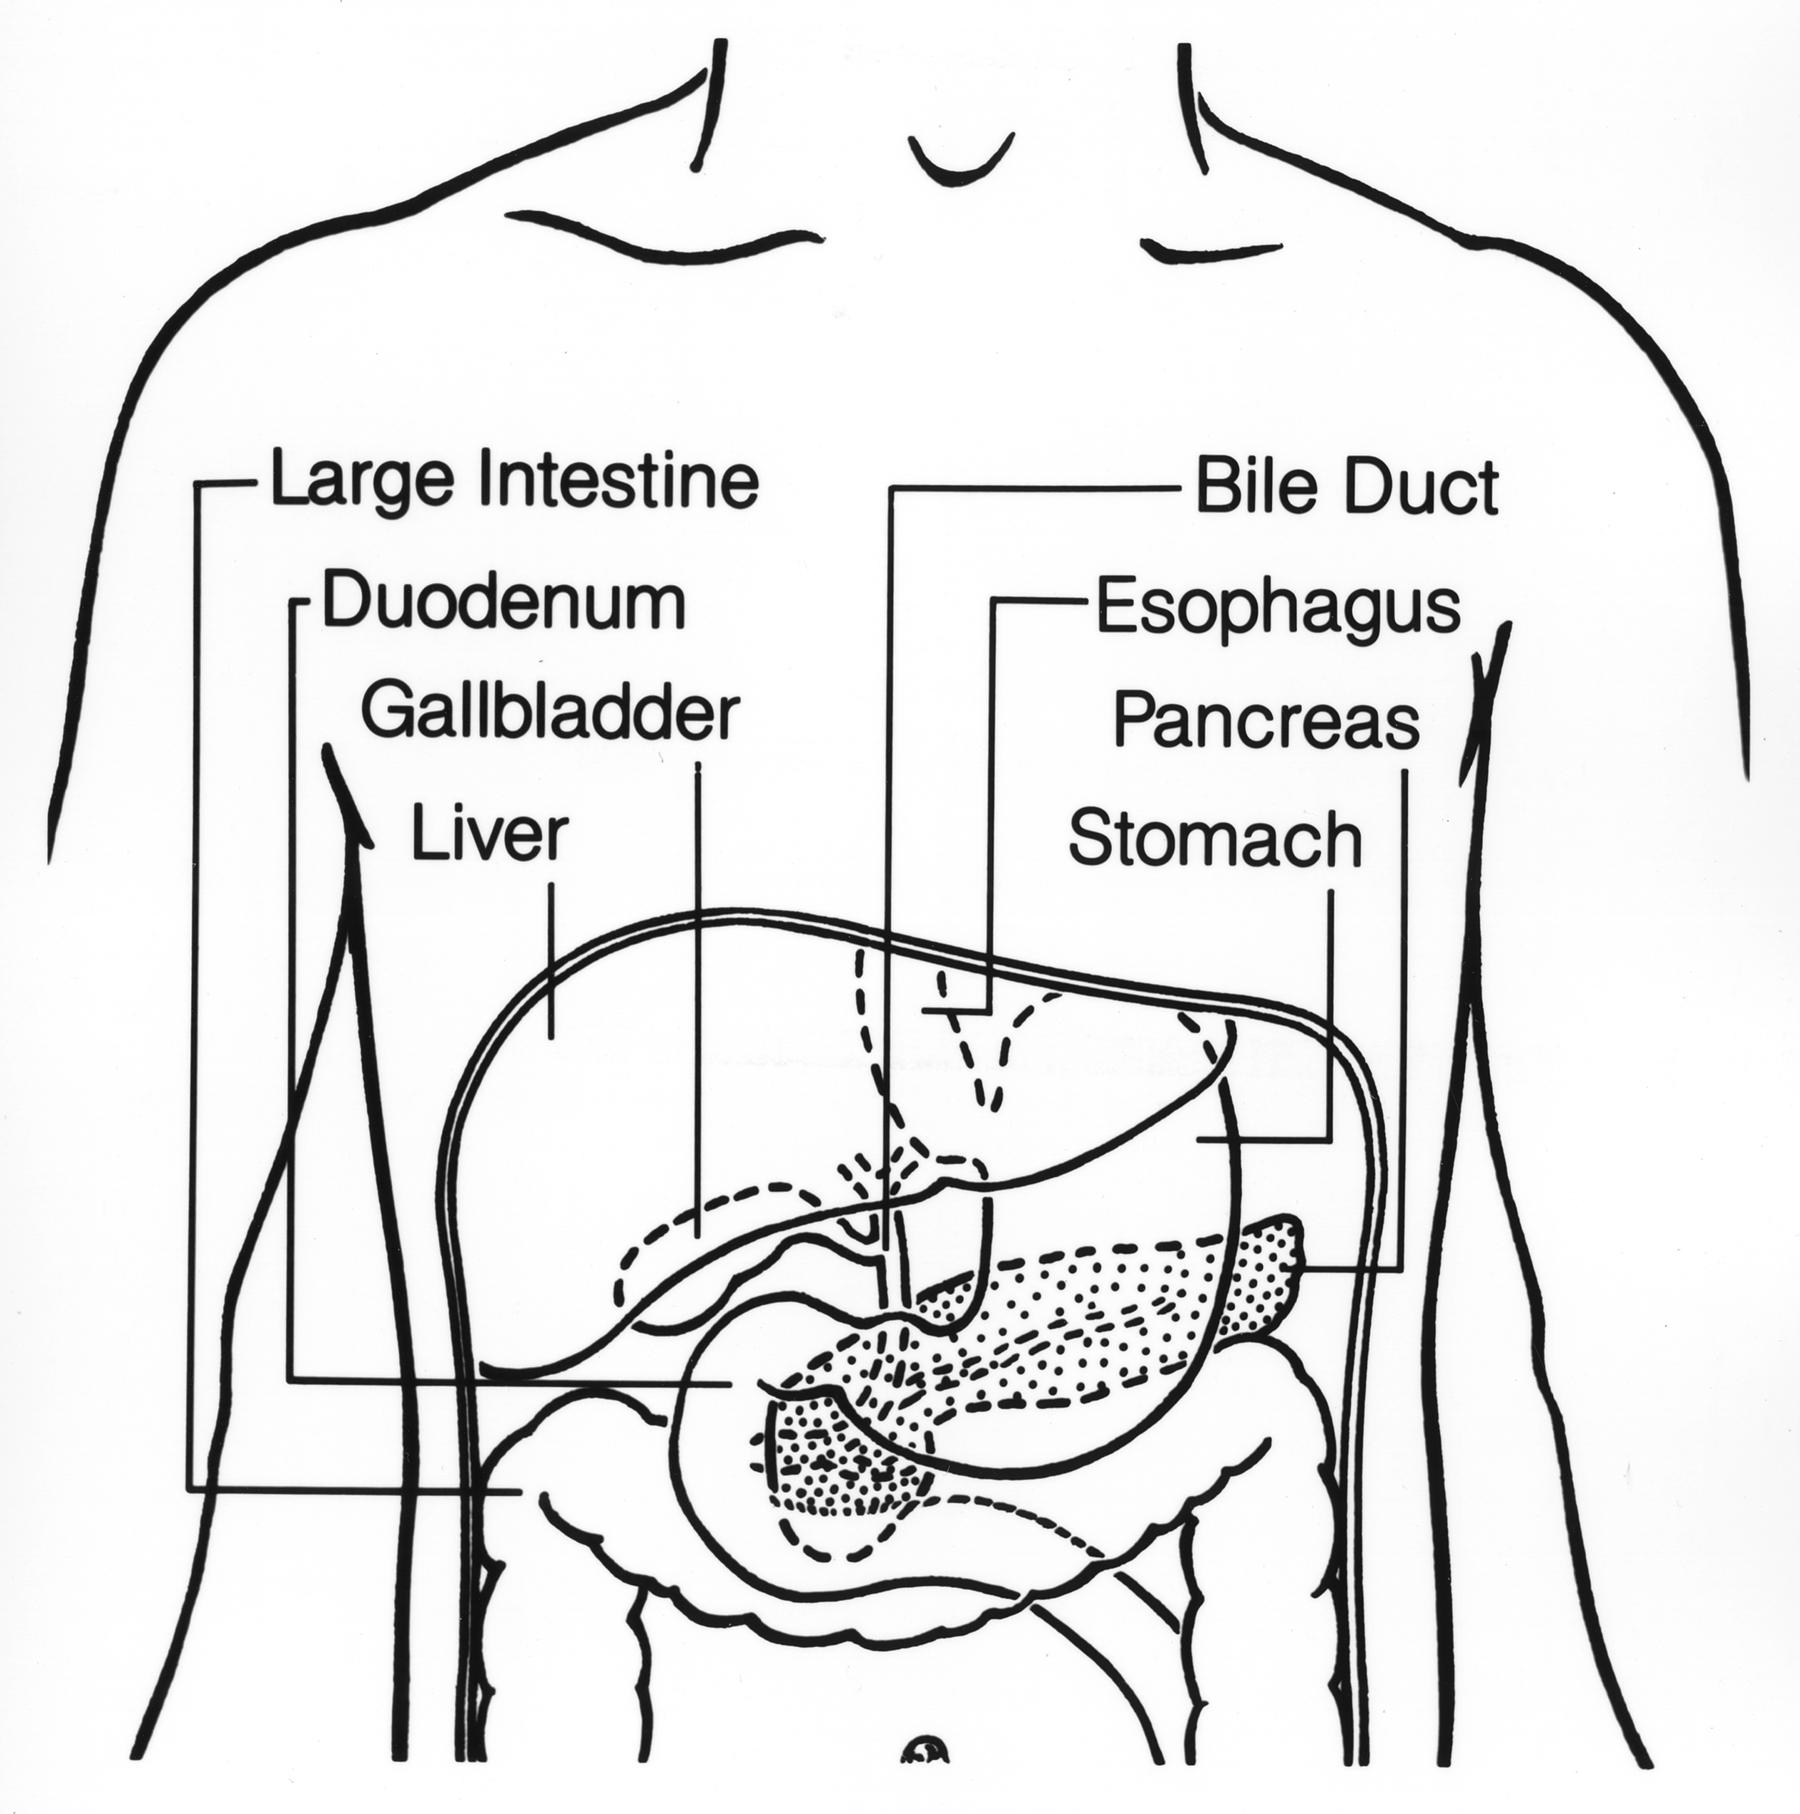 large intestine diagram blank house electrical wiring australia file digestive tract upper jpg wikimedia commons